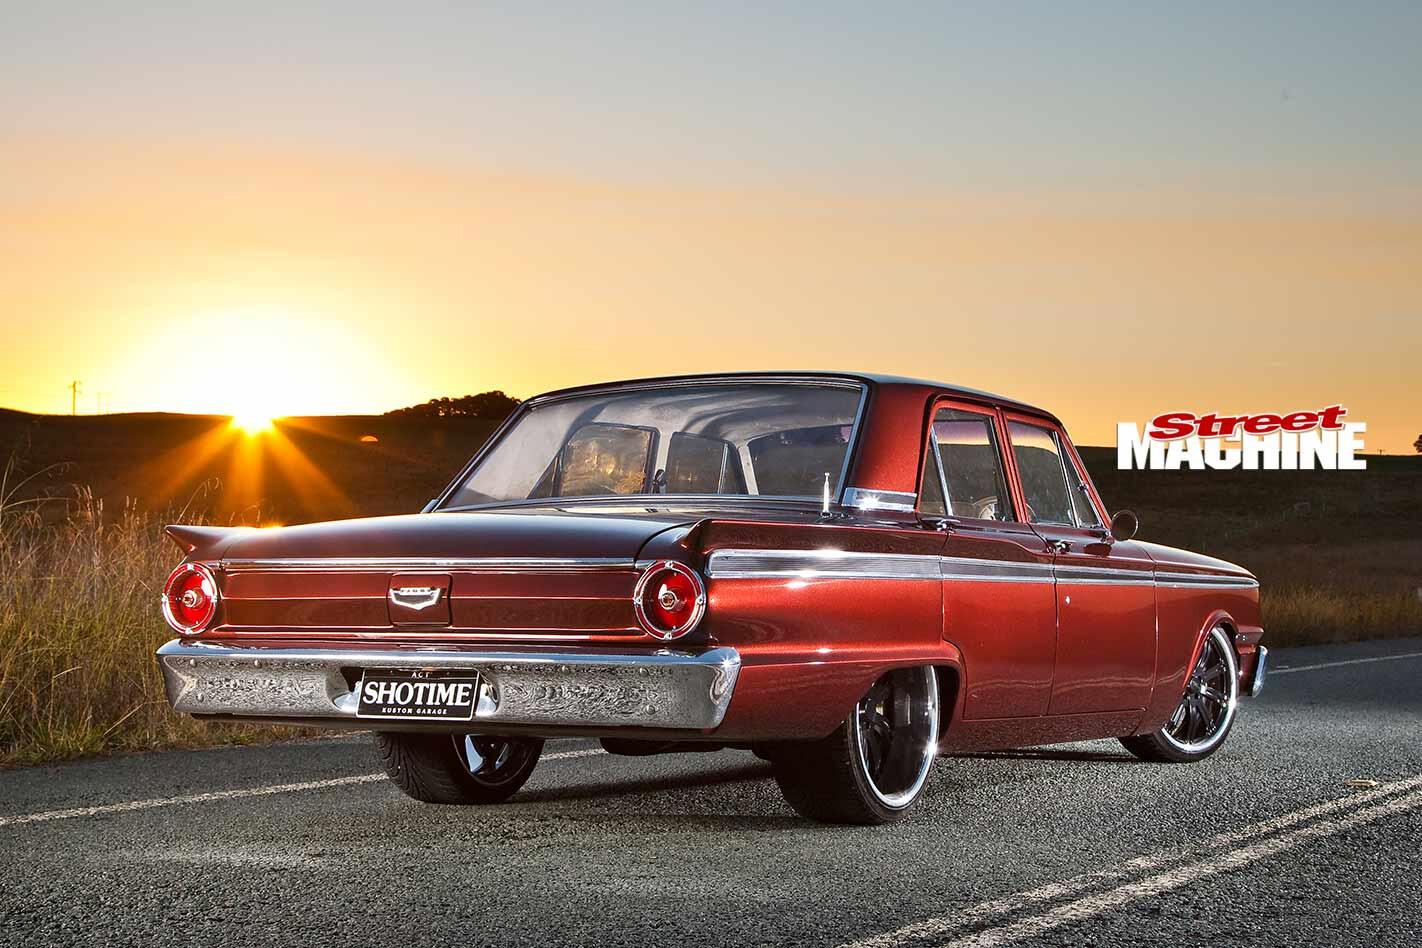 Ford Compact Fairlane rear